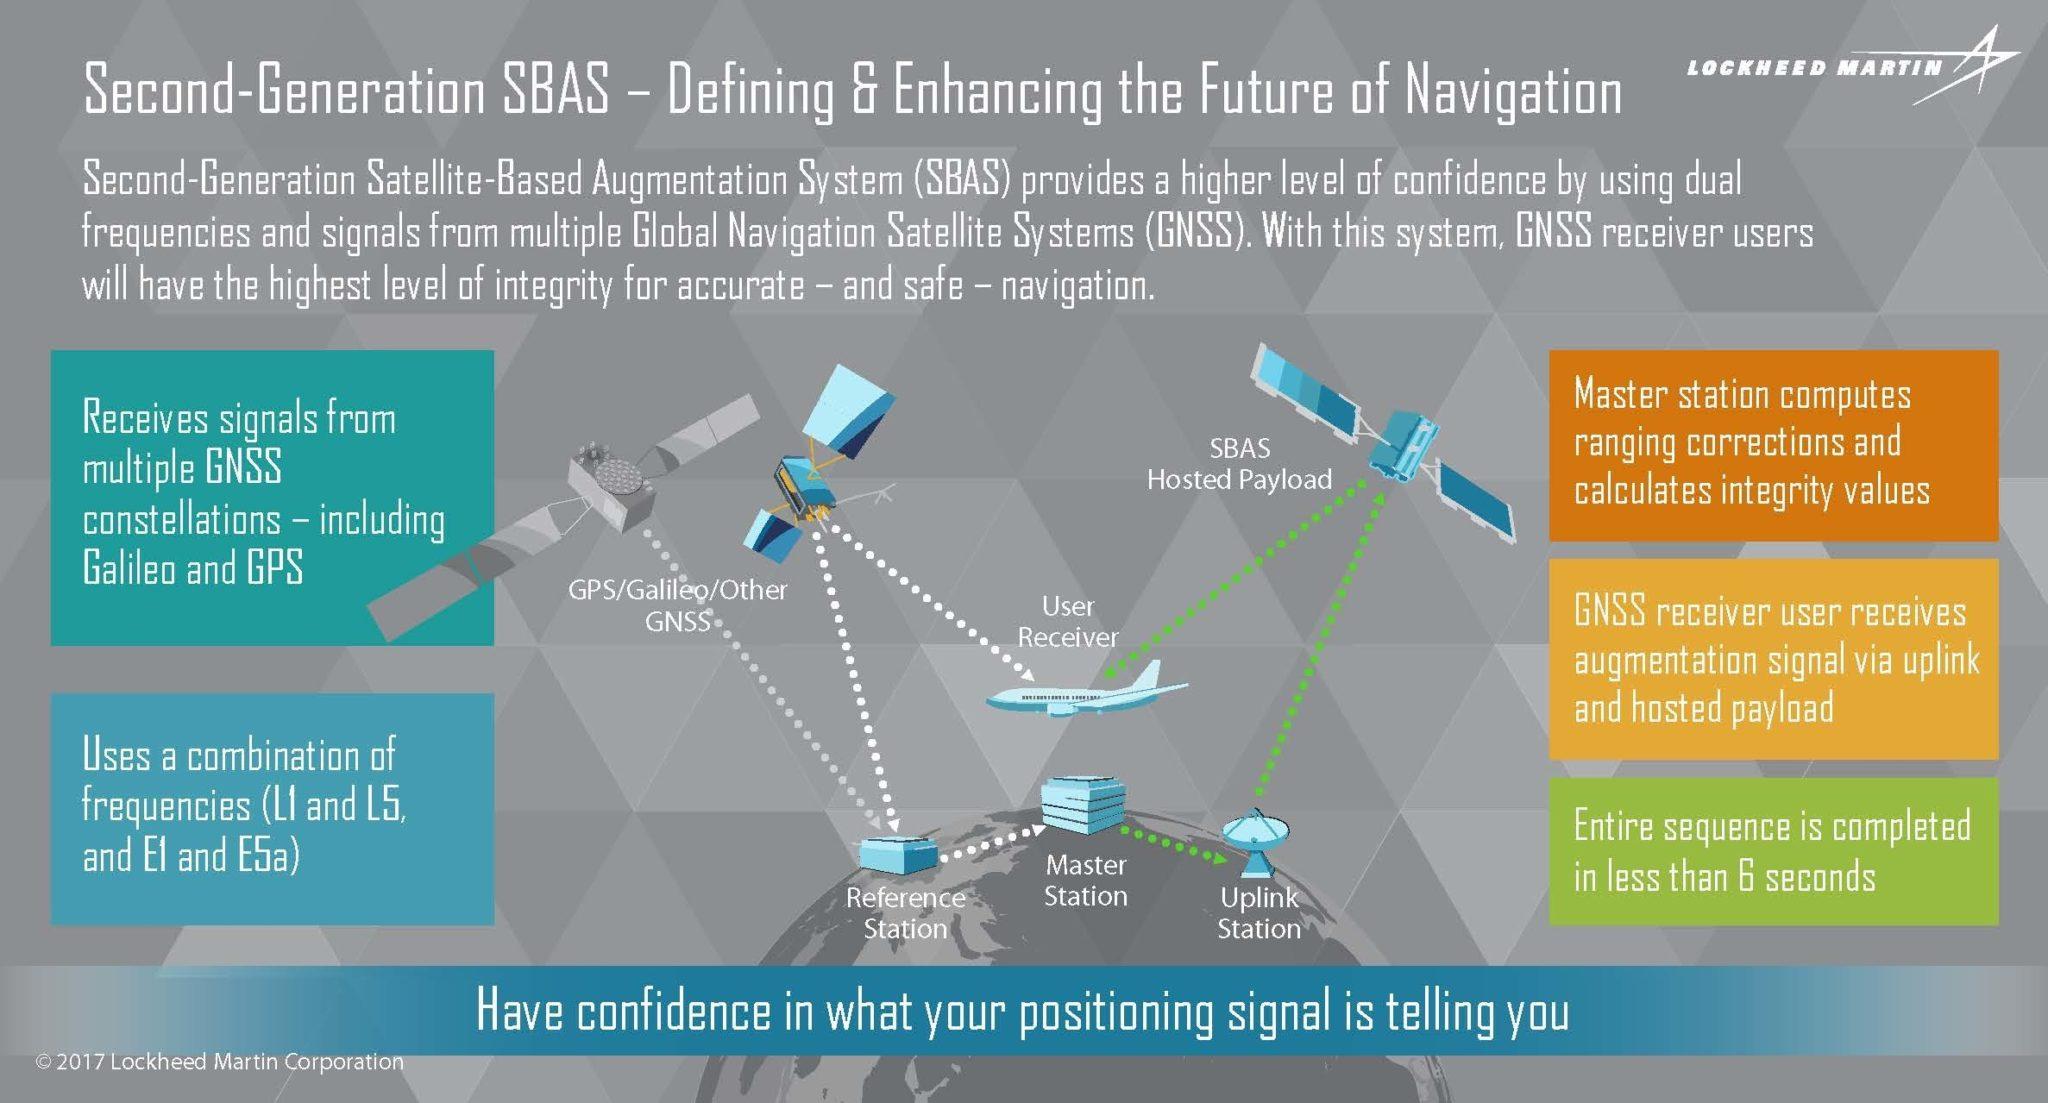 Second-Generation Satellite-Based Augmentation System (SBAS).